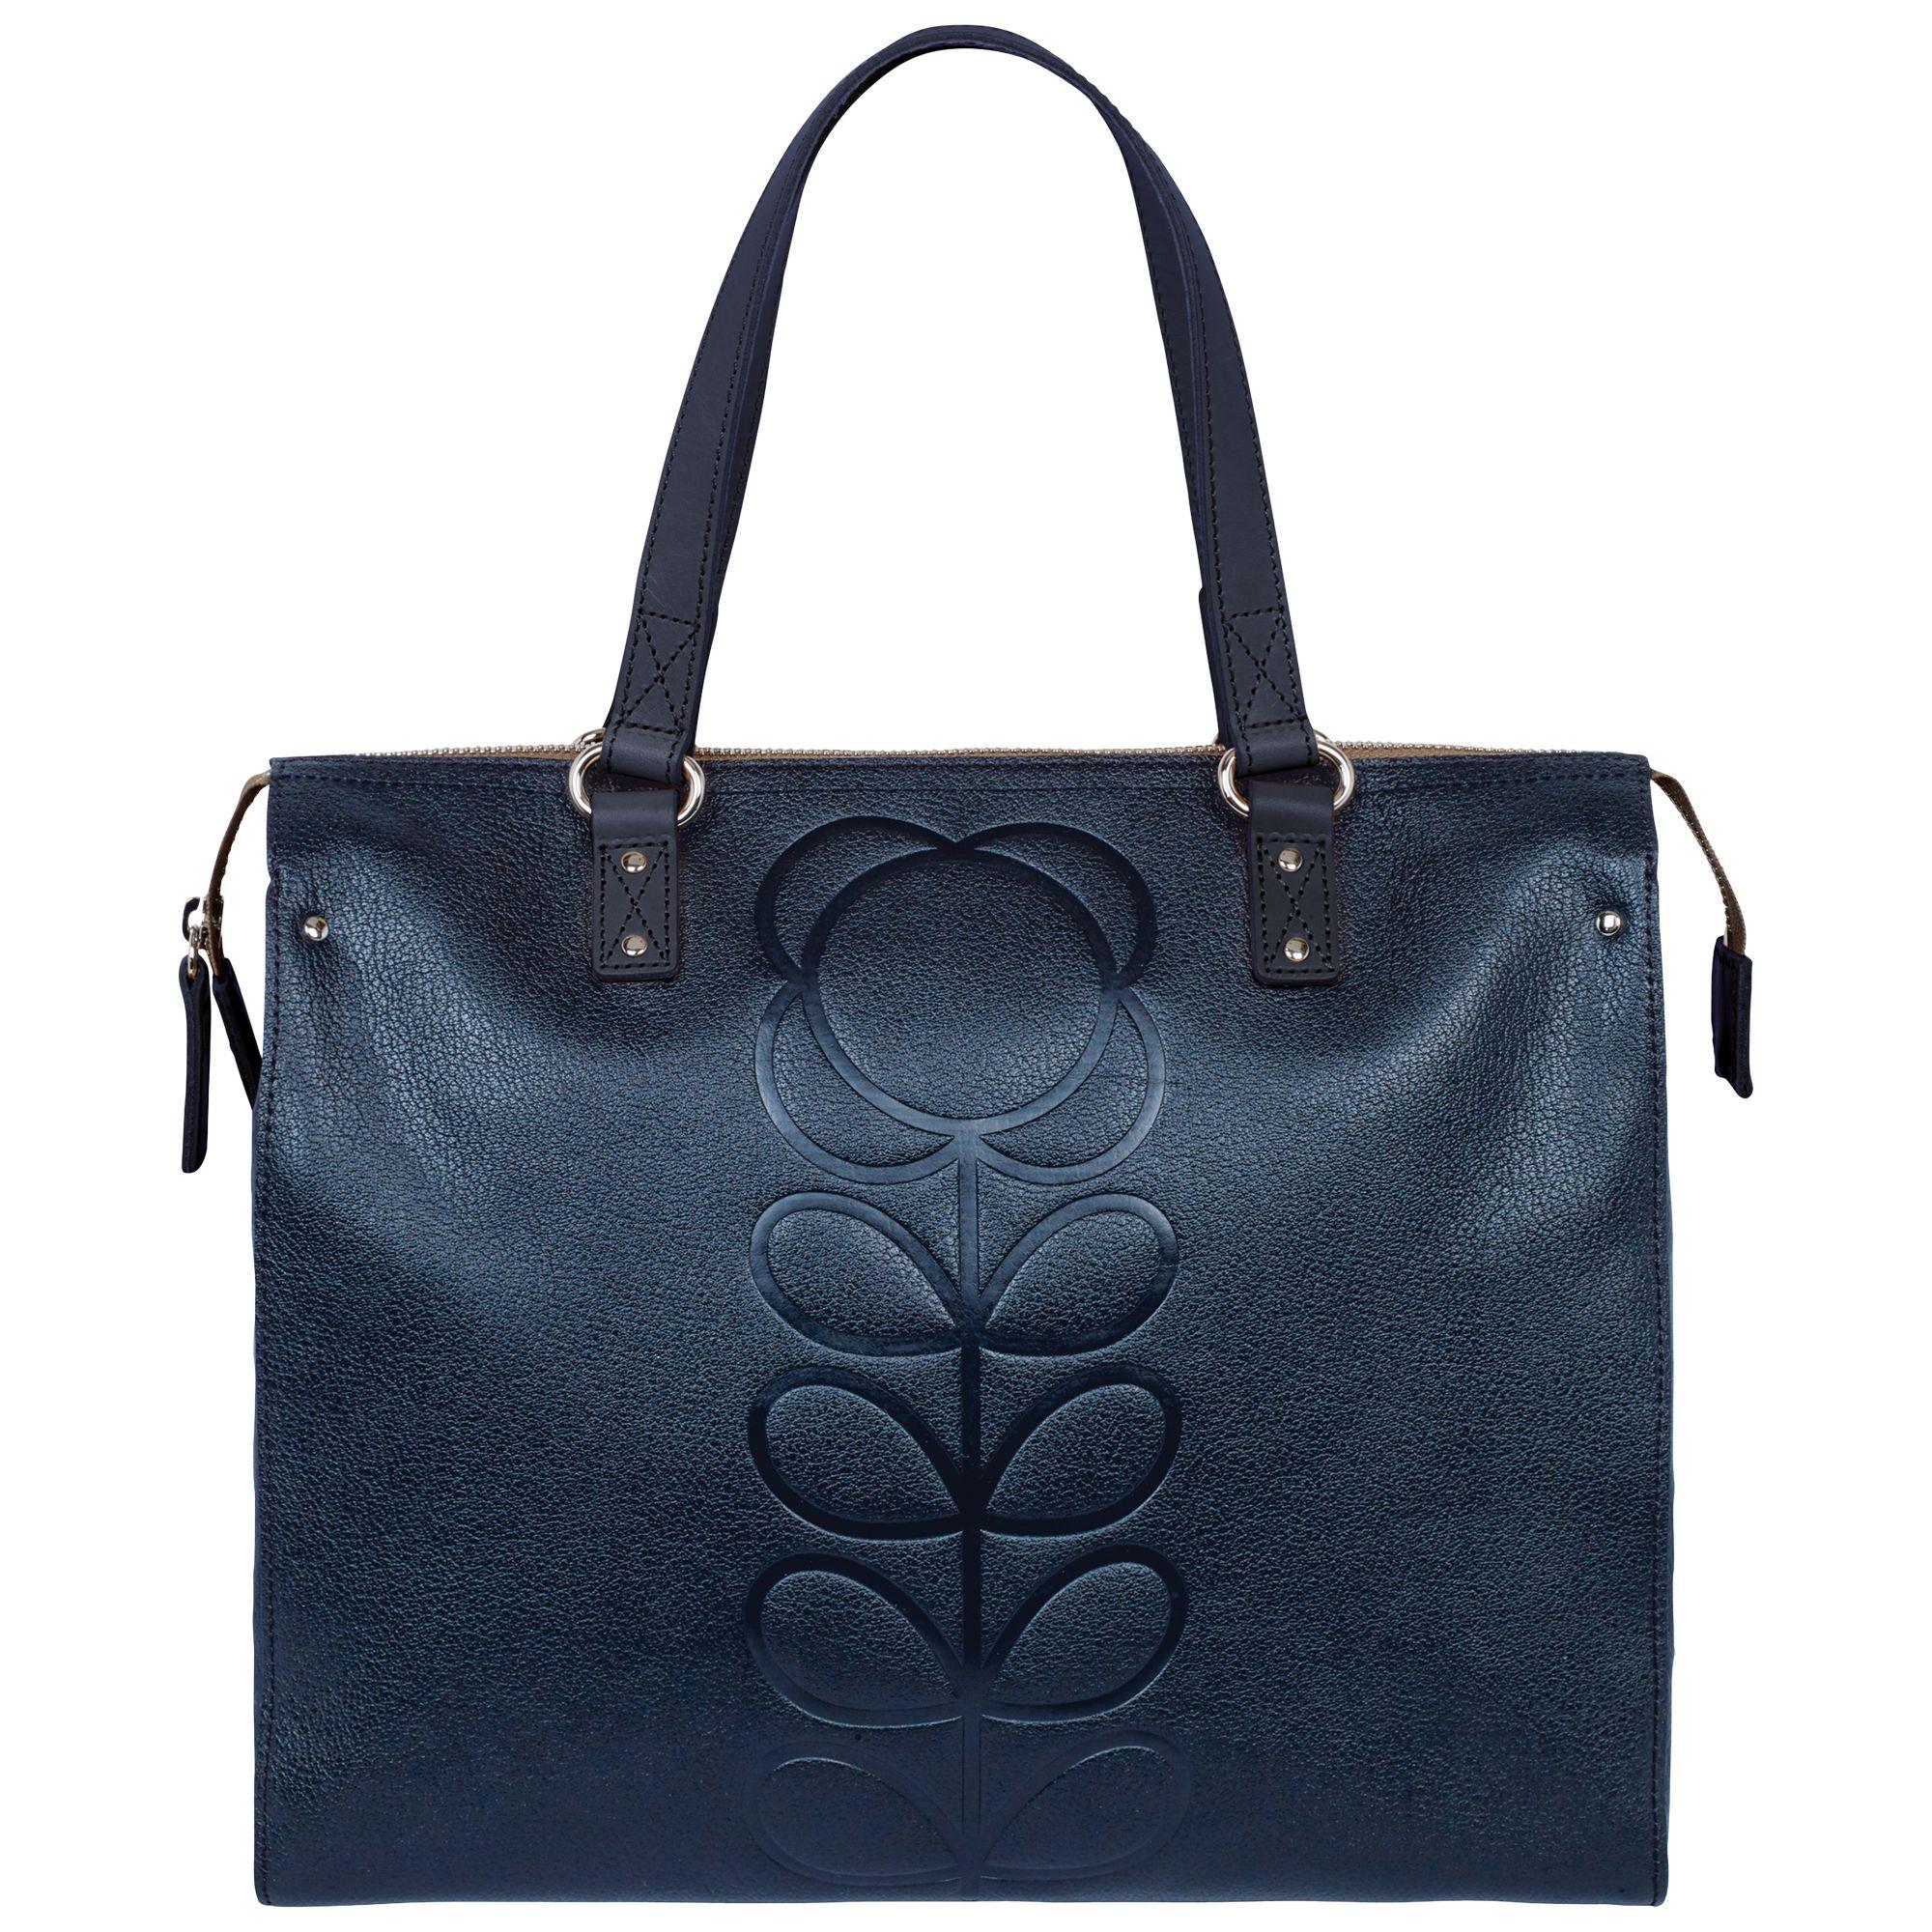 Orla Kiely Embossed Flower Leather Tote Bag Navy At John